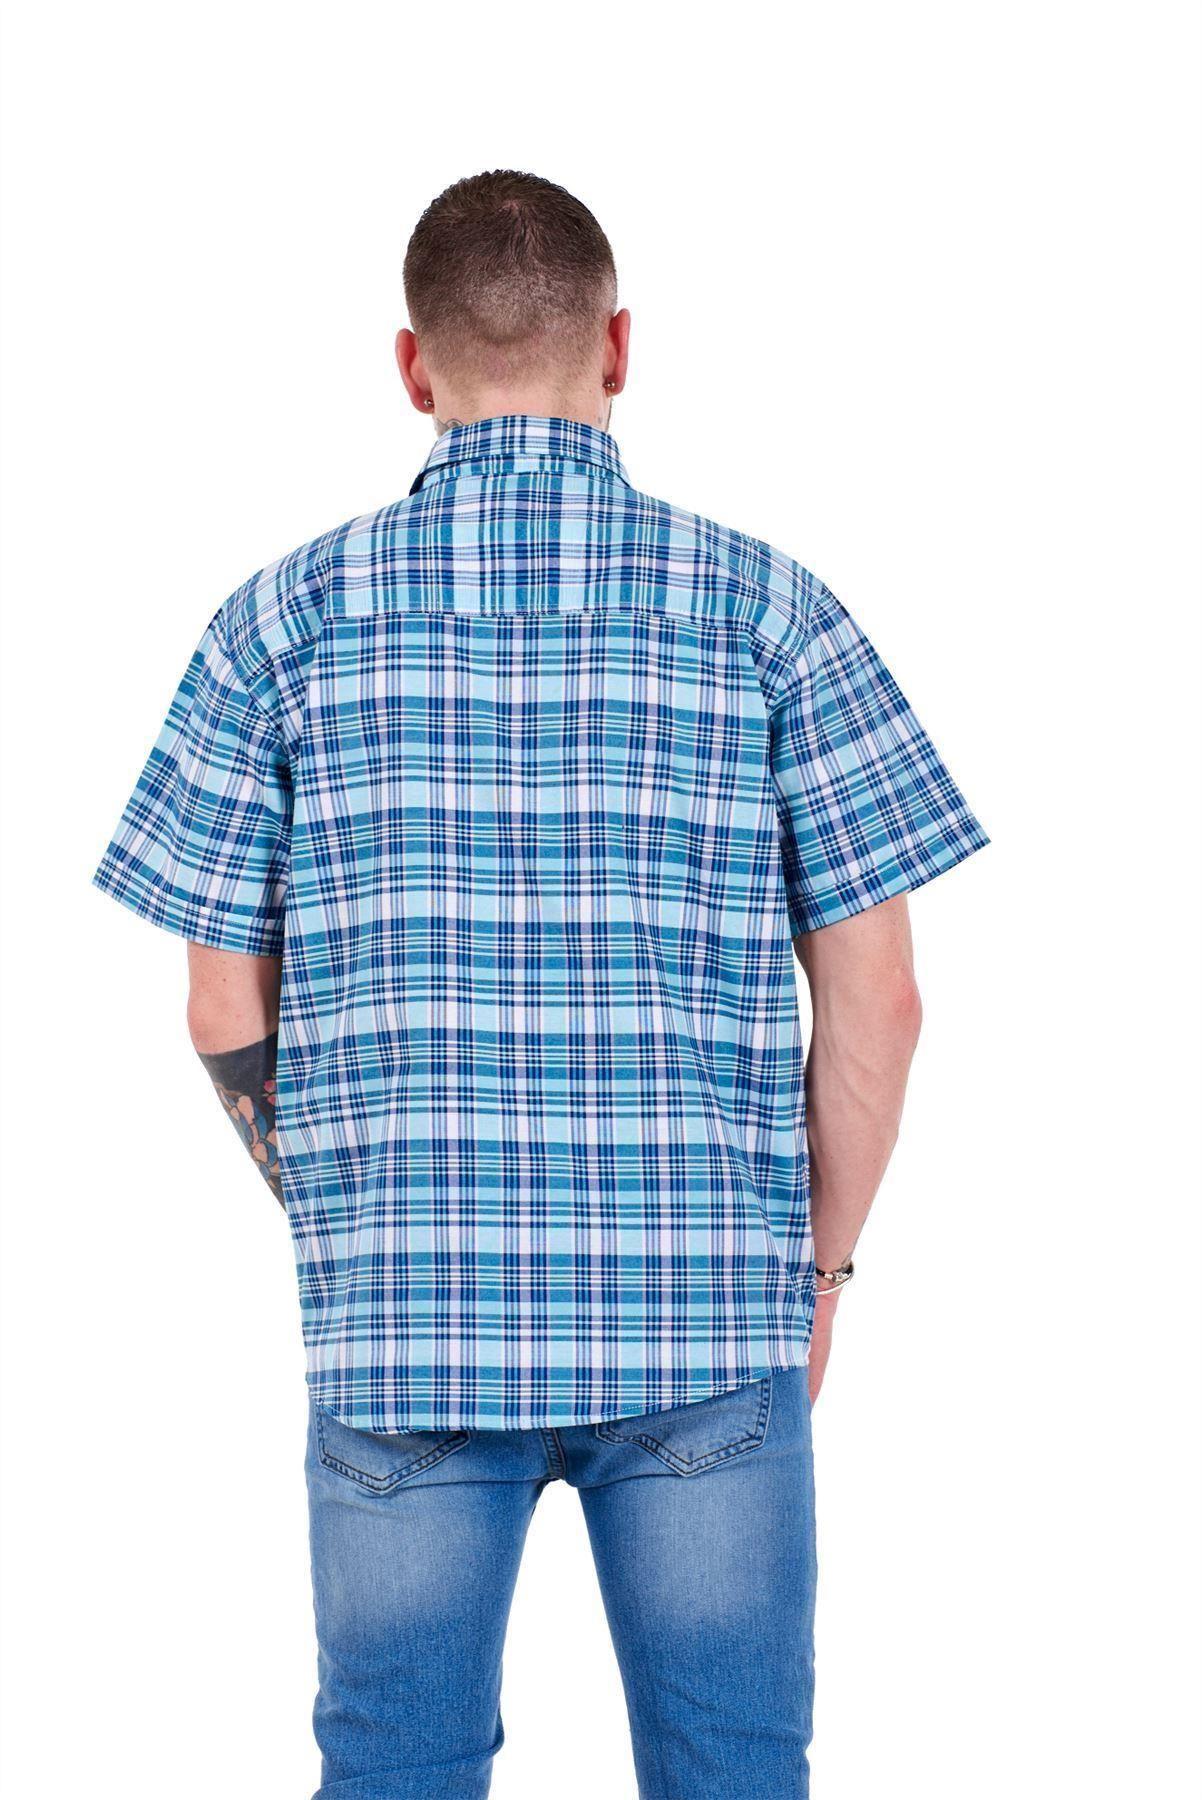 Mens-Regular-Big-Size-Shirts-Checked-Cotton-Blend-Casual-Short-Sleeve-M-to-5XL thumbnail 31